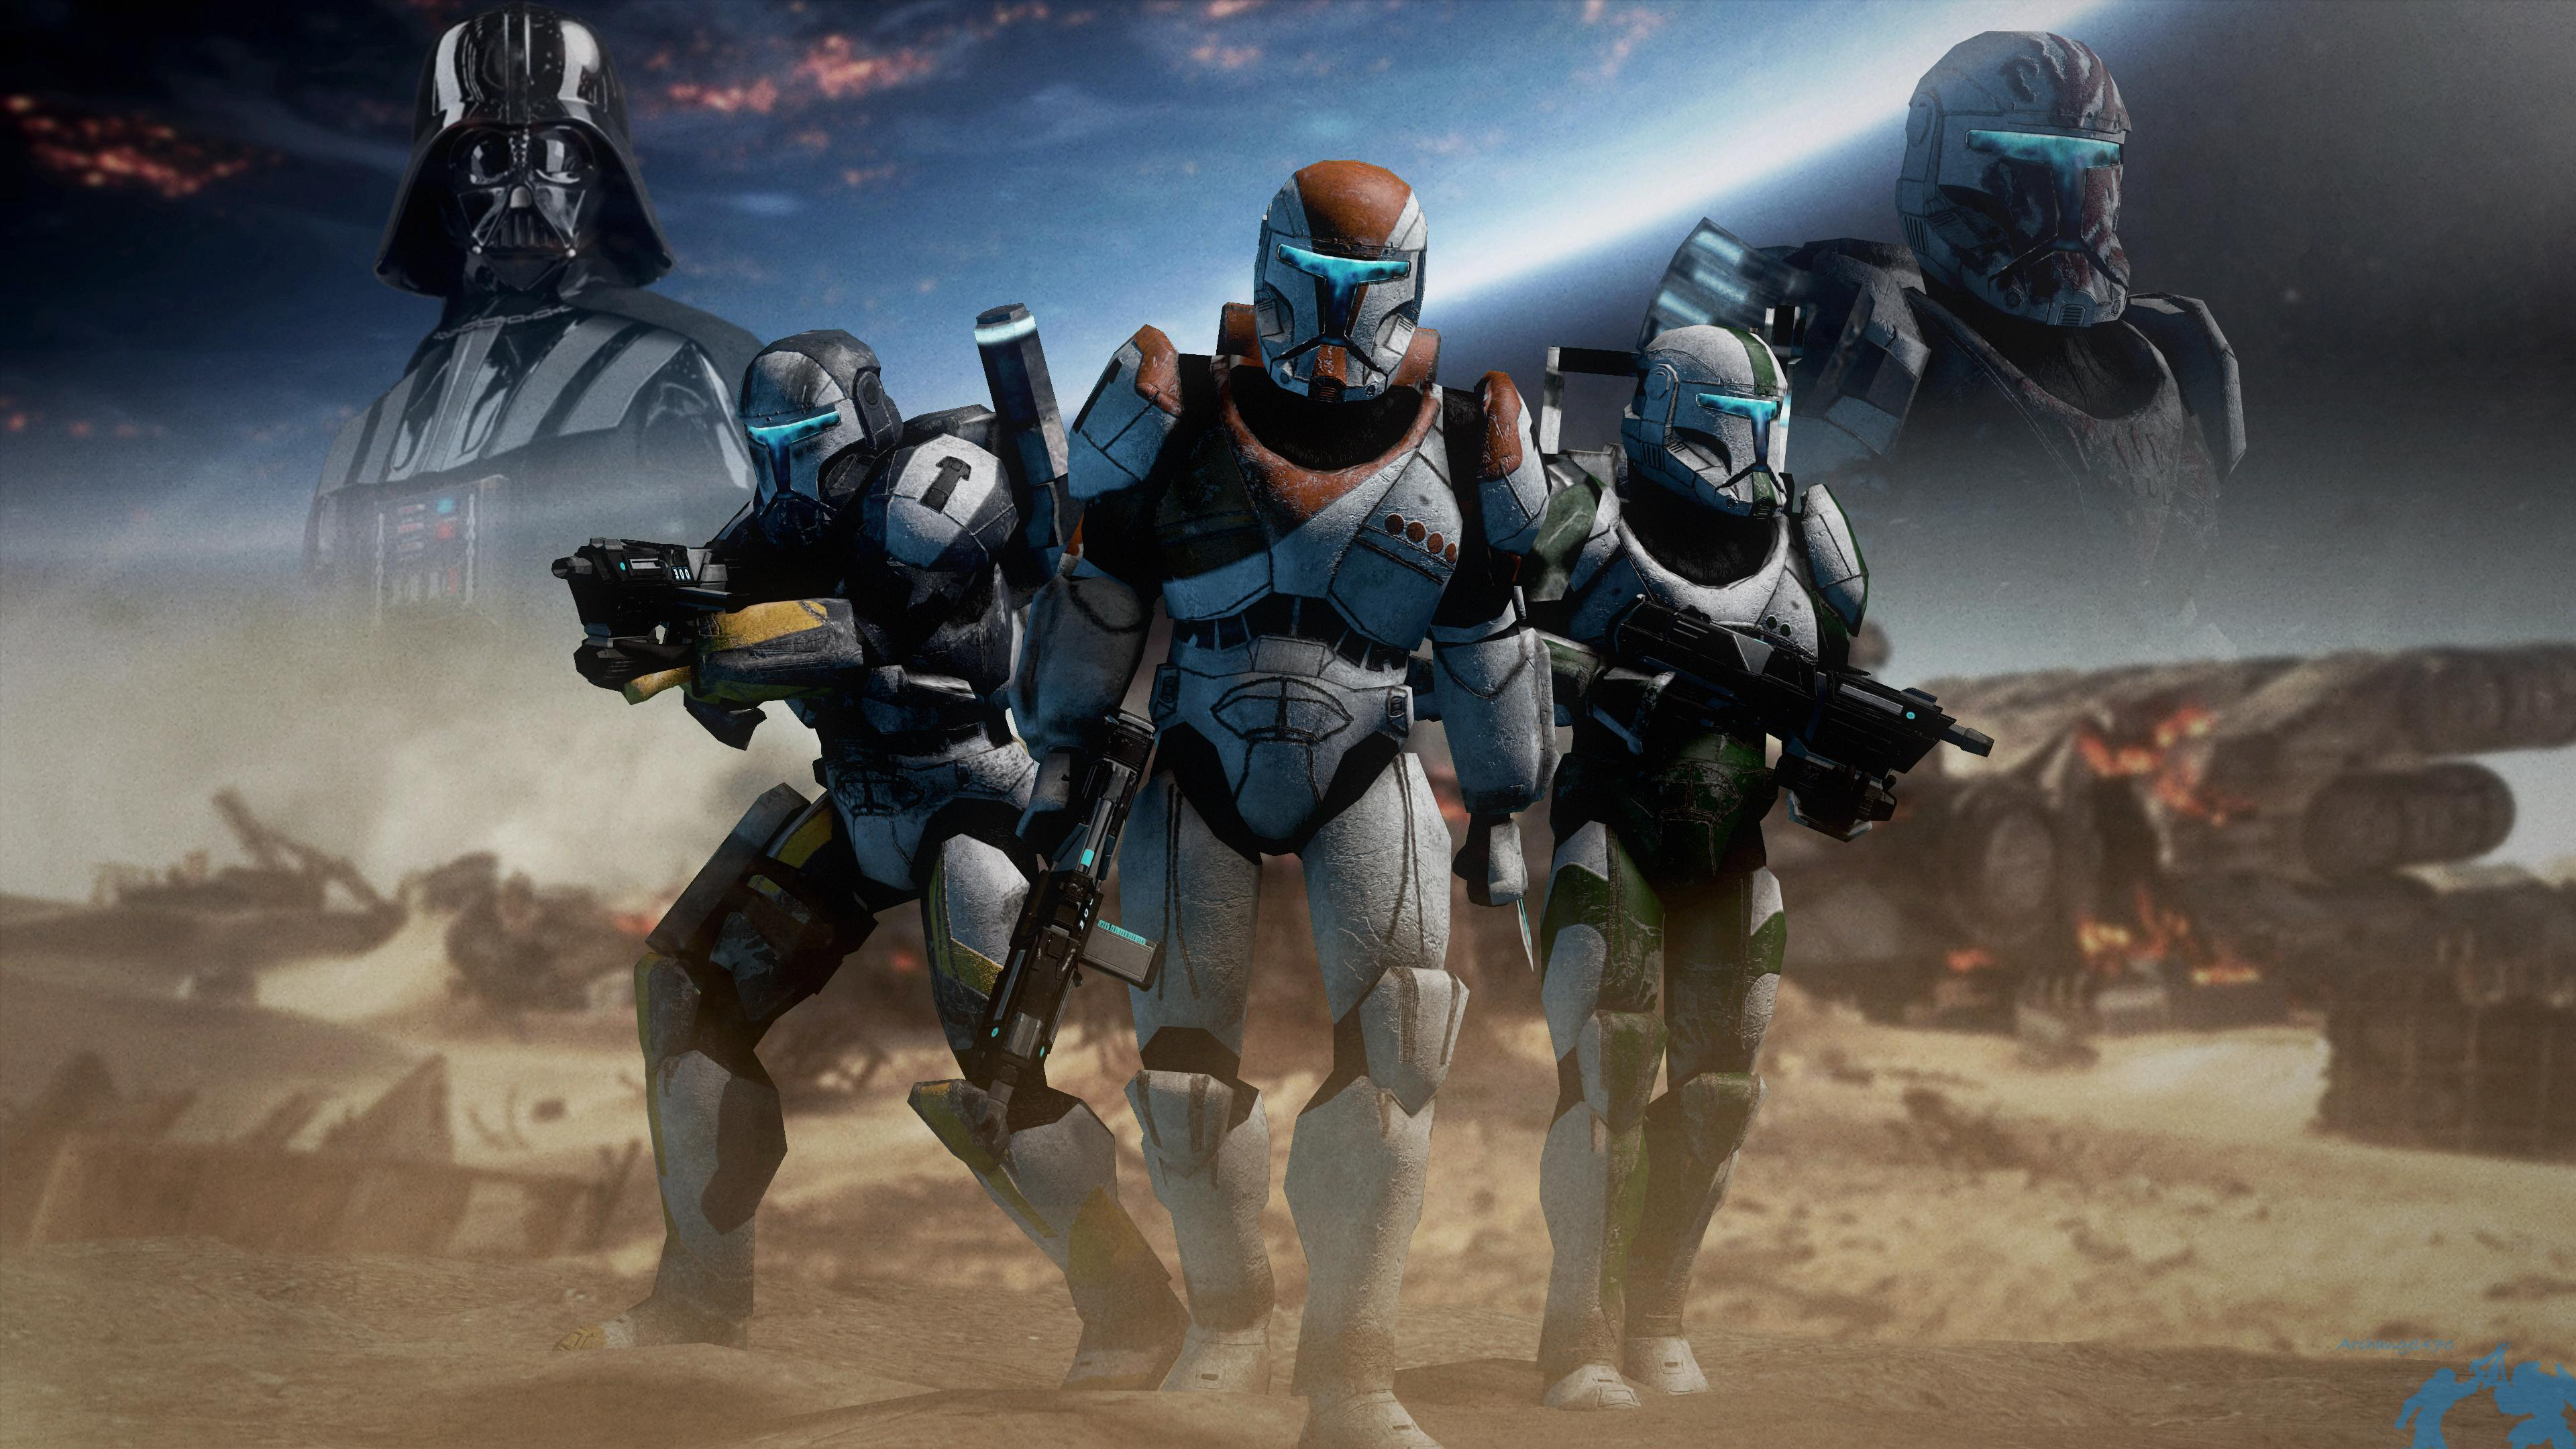 Акции Ubisoft подскочили после анонса игры по франшизе Star Wars